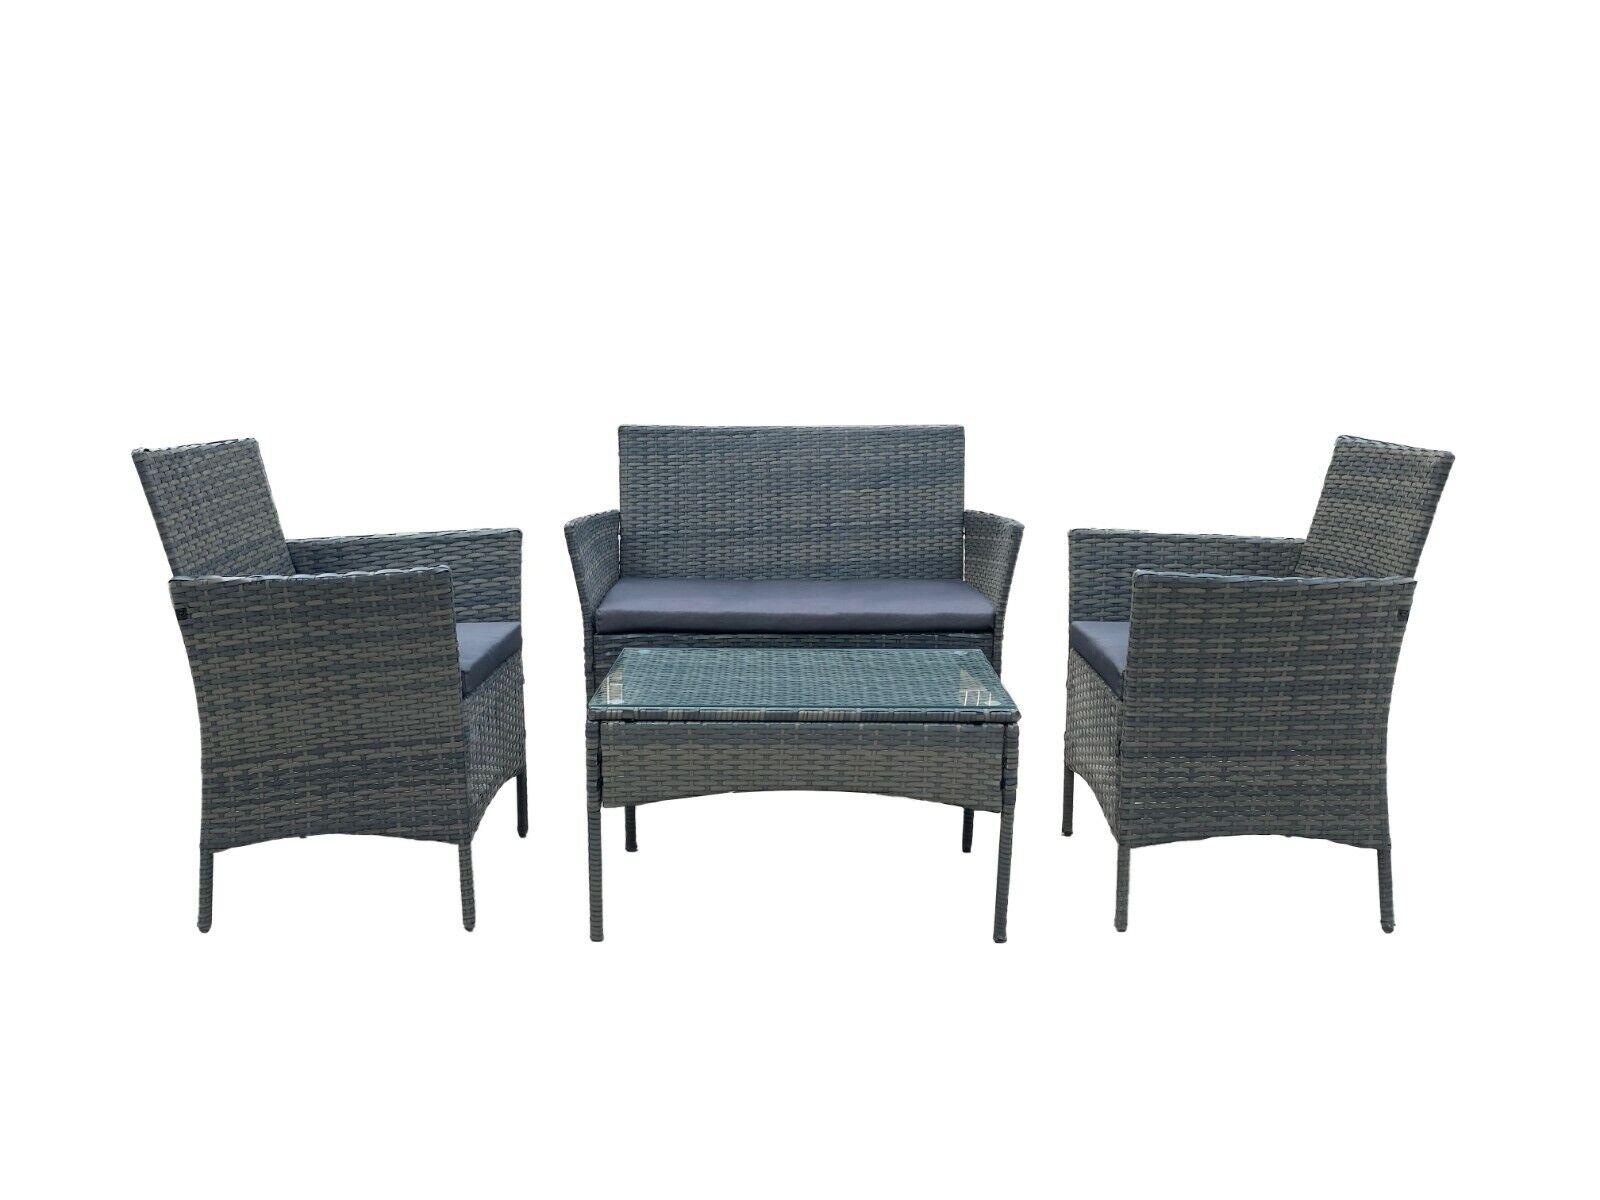 Garden Furniture - Rattan Garden Furniture Set Conservatory Patio Outdoor Table Chairs Sofa Seat